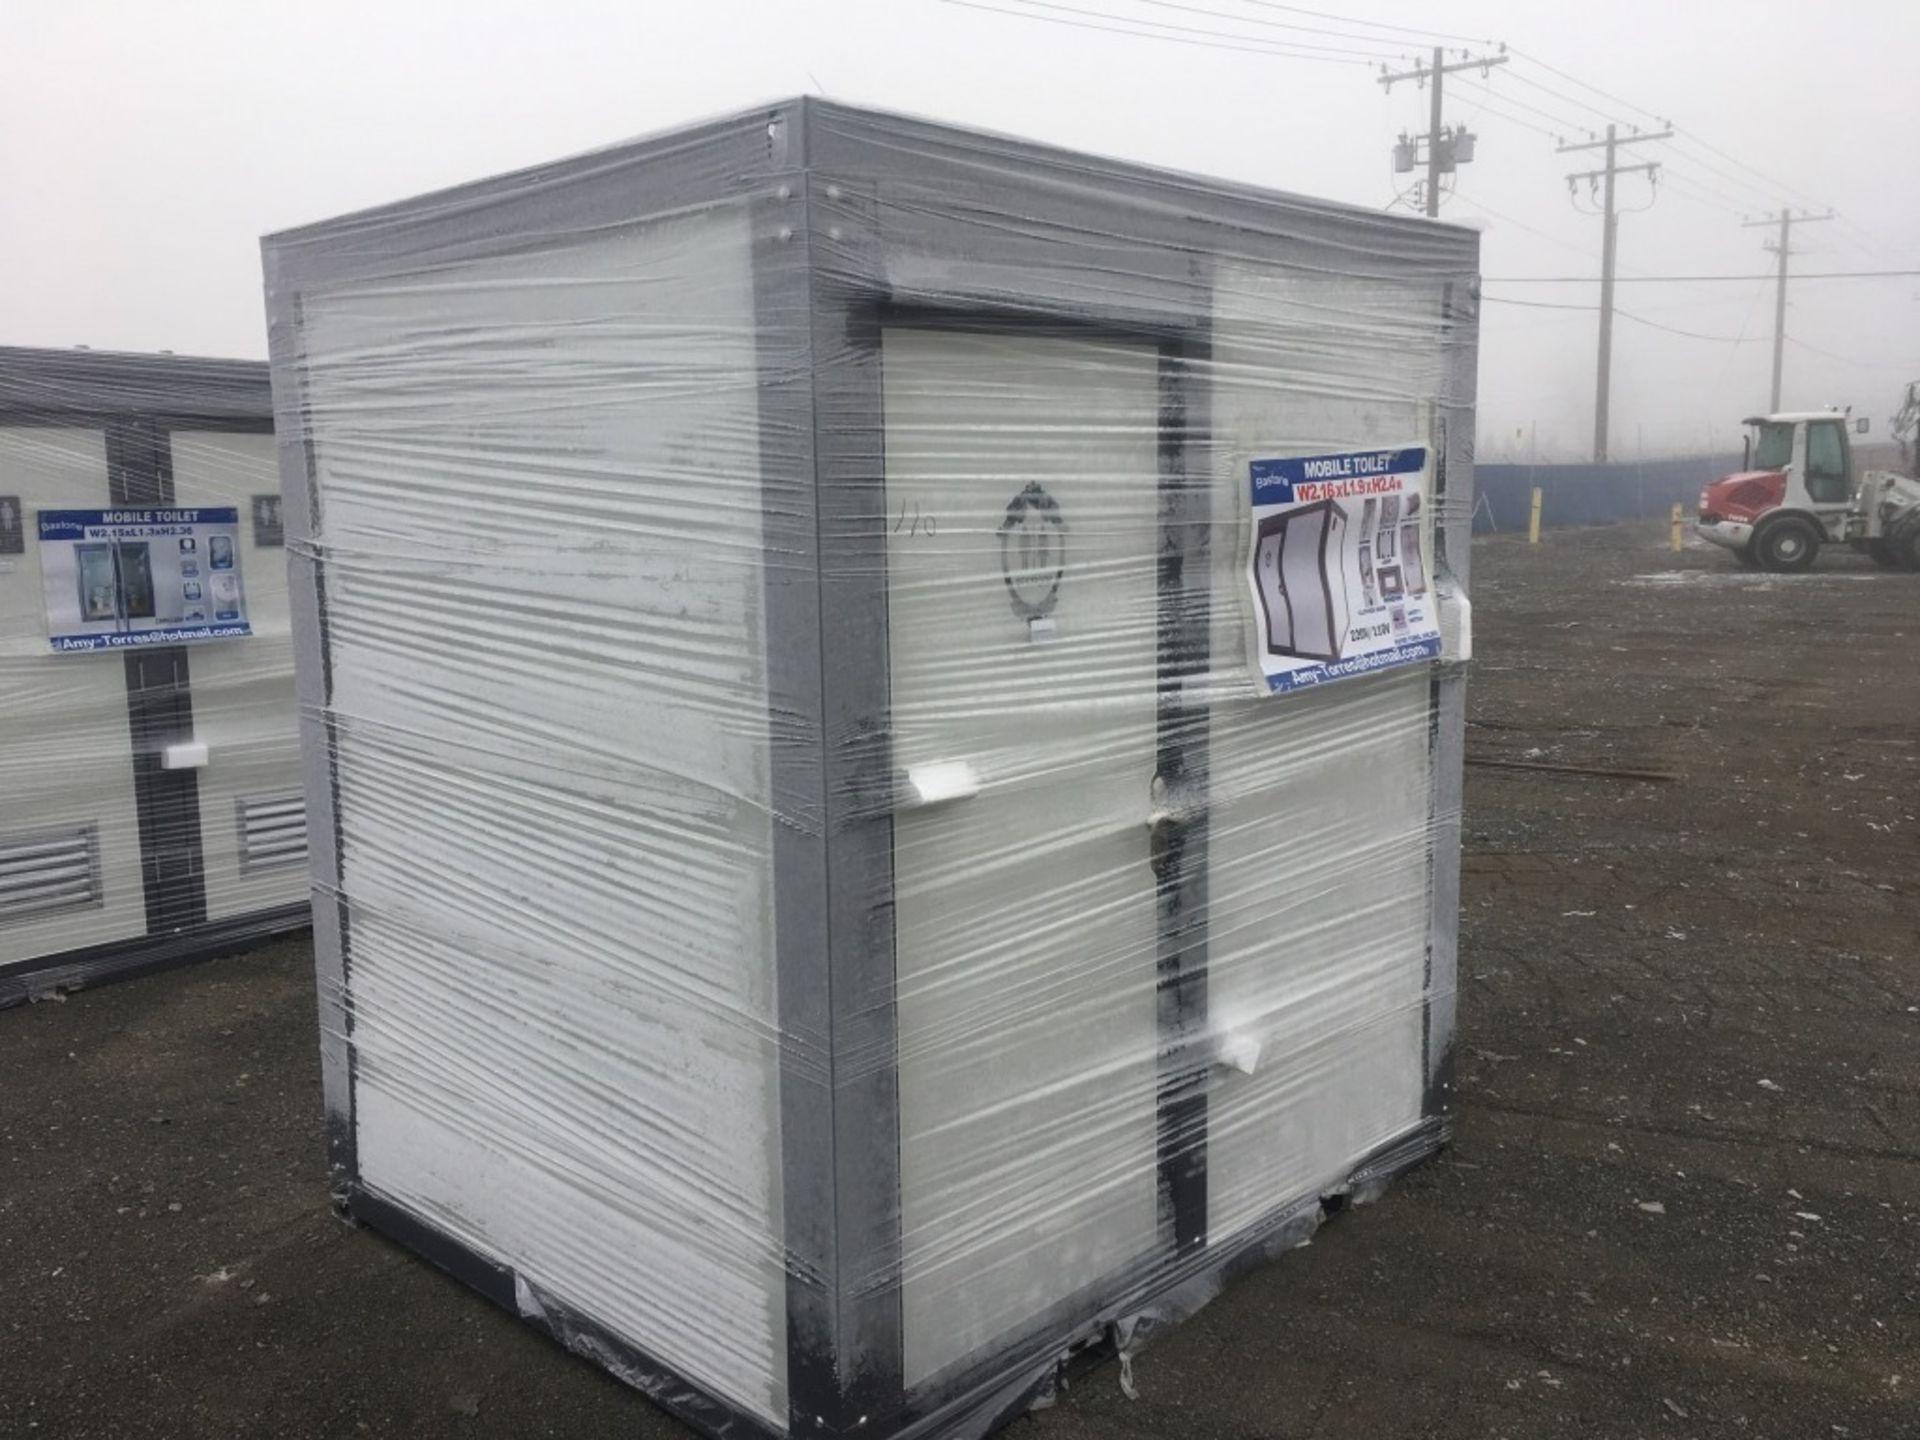 2020 Bastone Portable Restroom w/Shower - Image 3 of 5